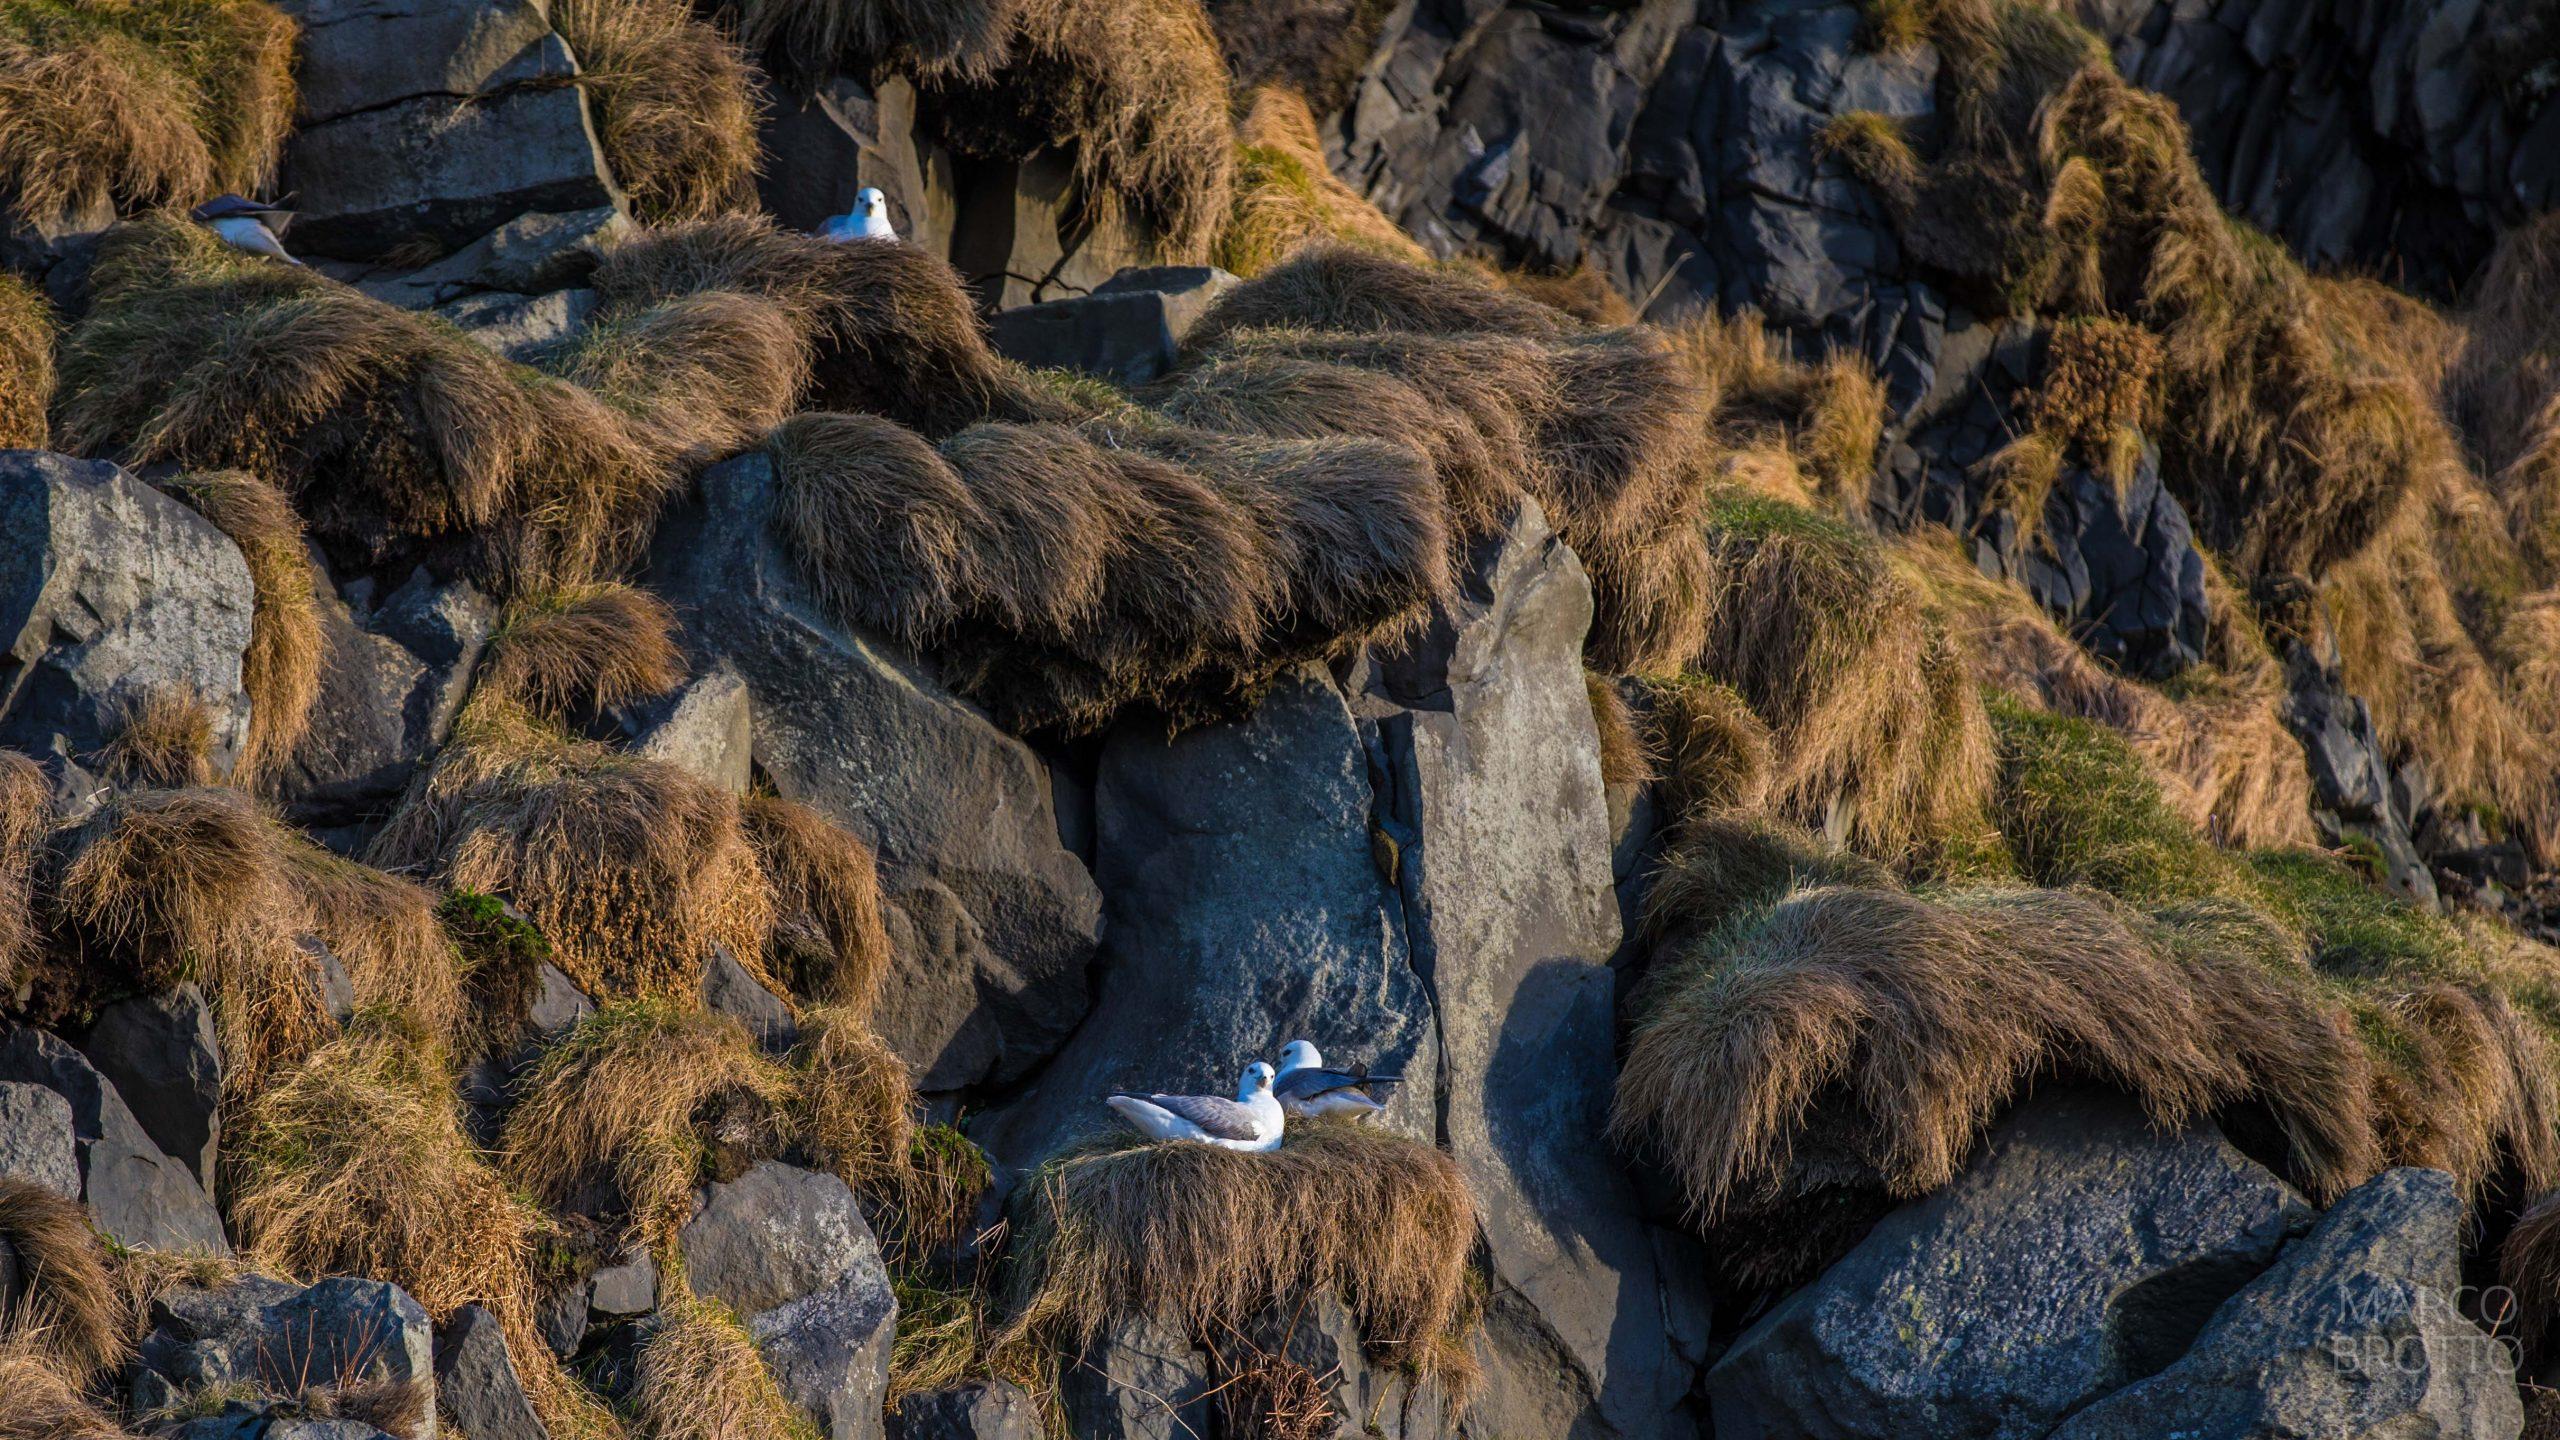 2018-01-25_ICELAND-2018-JAN-TRIGEMEOS-Canon-EOS-5D-Mark-IV31-51-16551